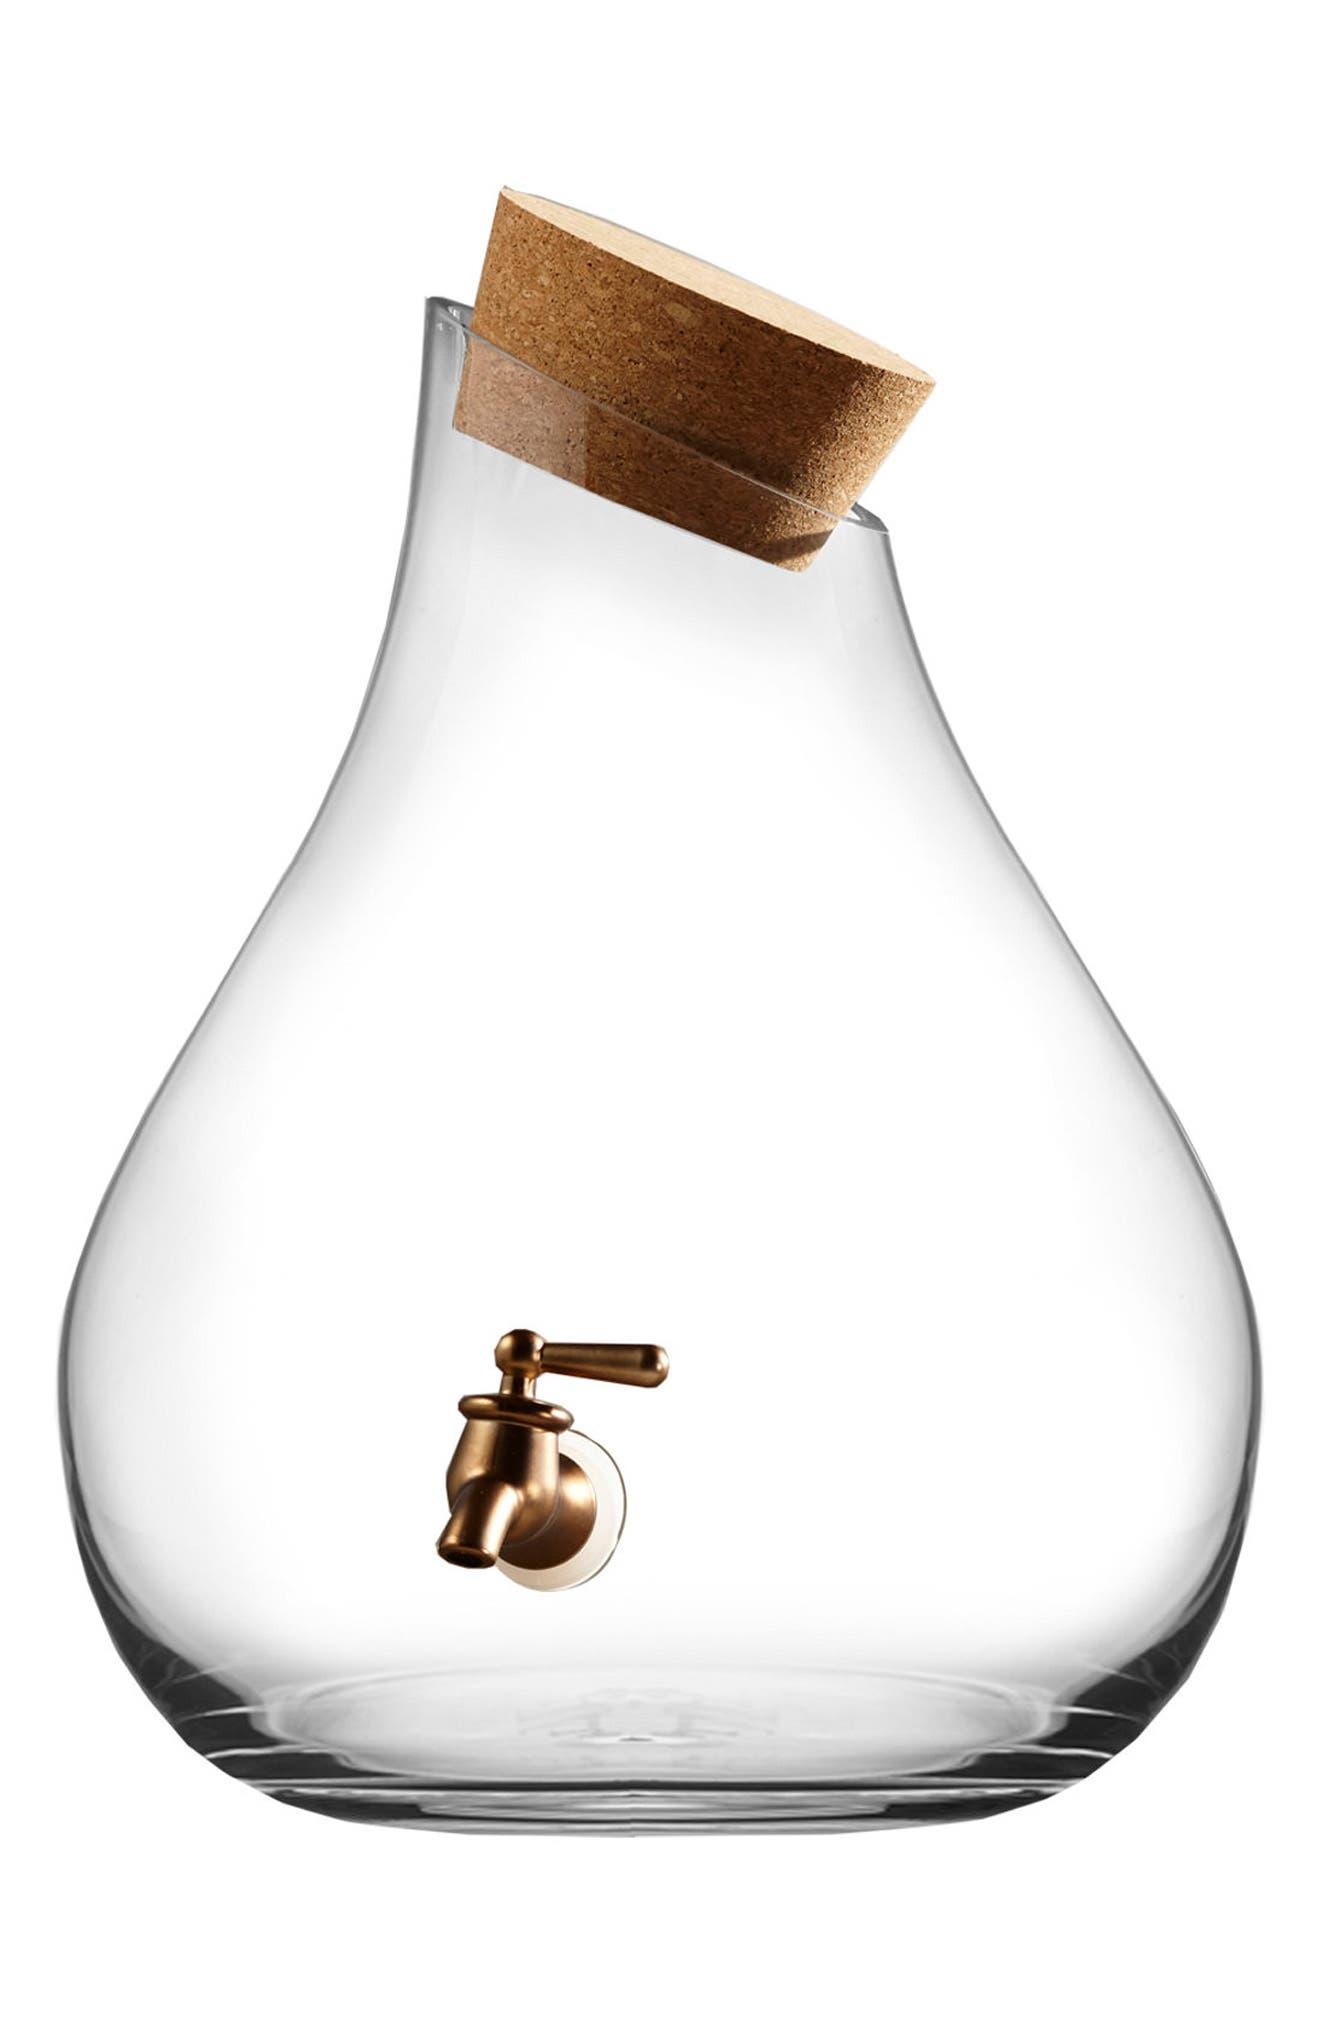 2.5-Gallon Beverage Dispenser,                         Main,                         color, Clear